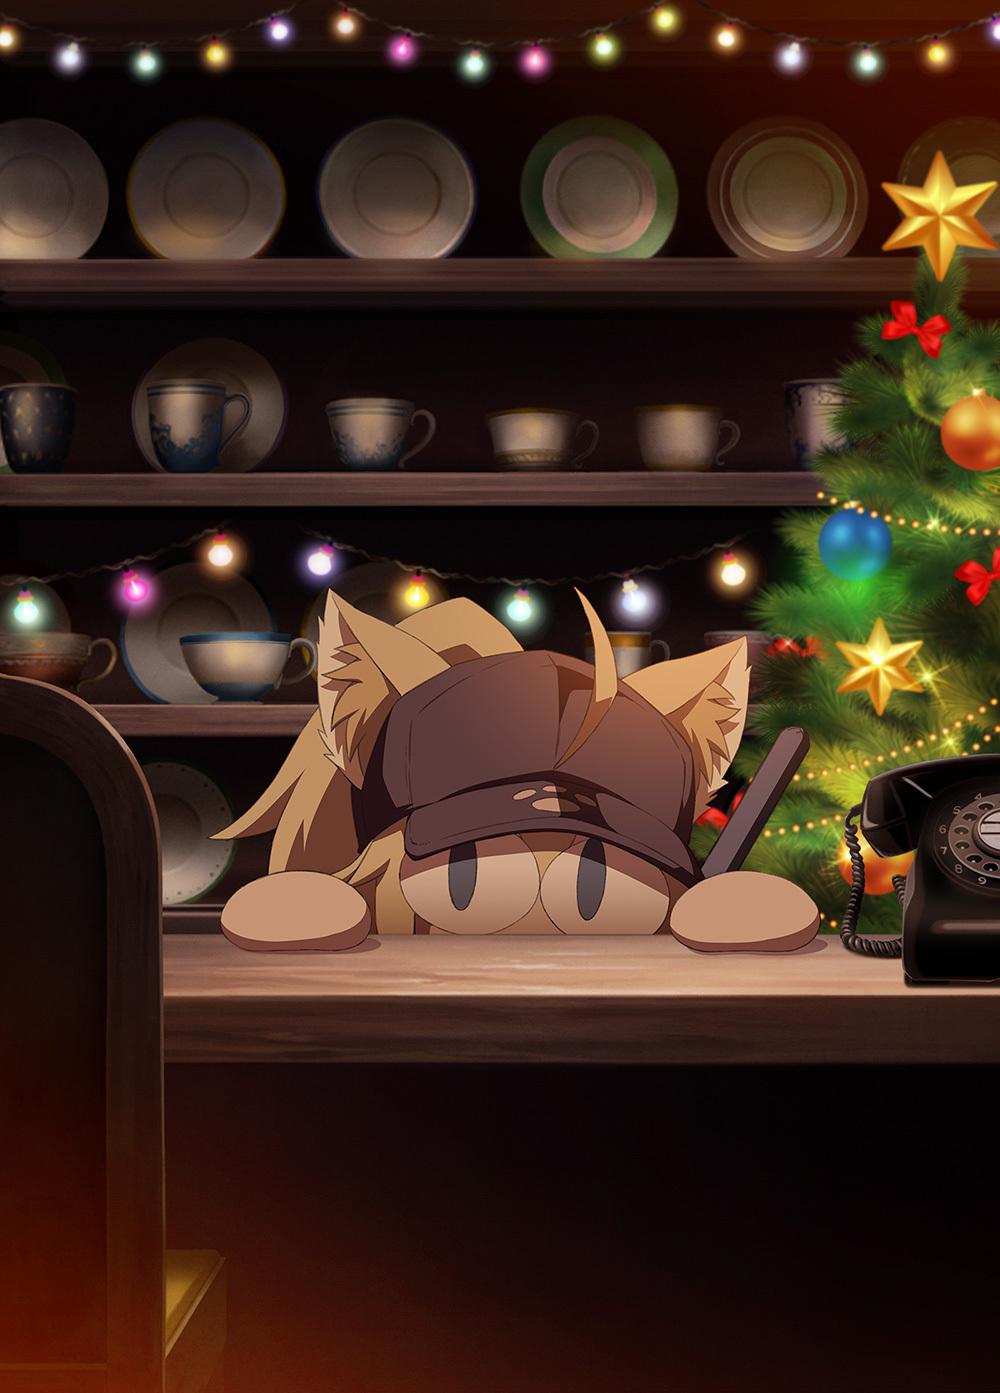 『Fate/Grand Order』完全新作ショートアニメ ティザービジュアル (C)TYPE-MOON / FGC PROJECT